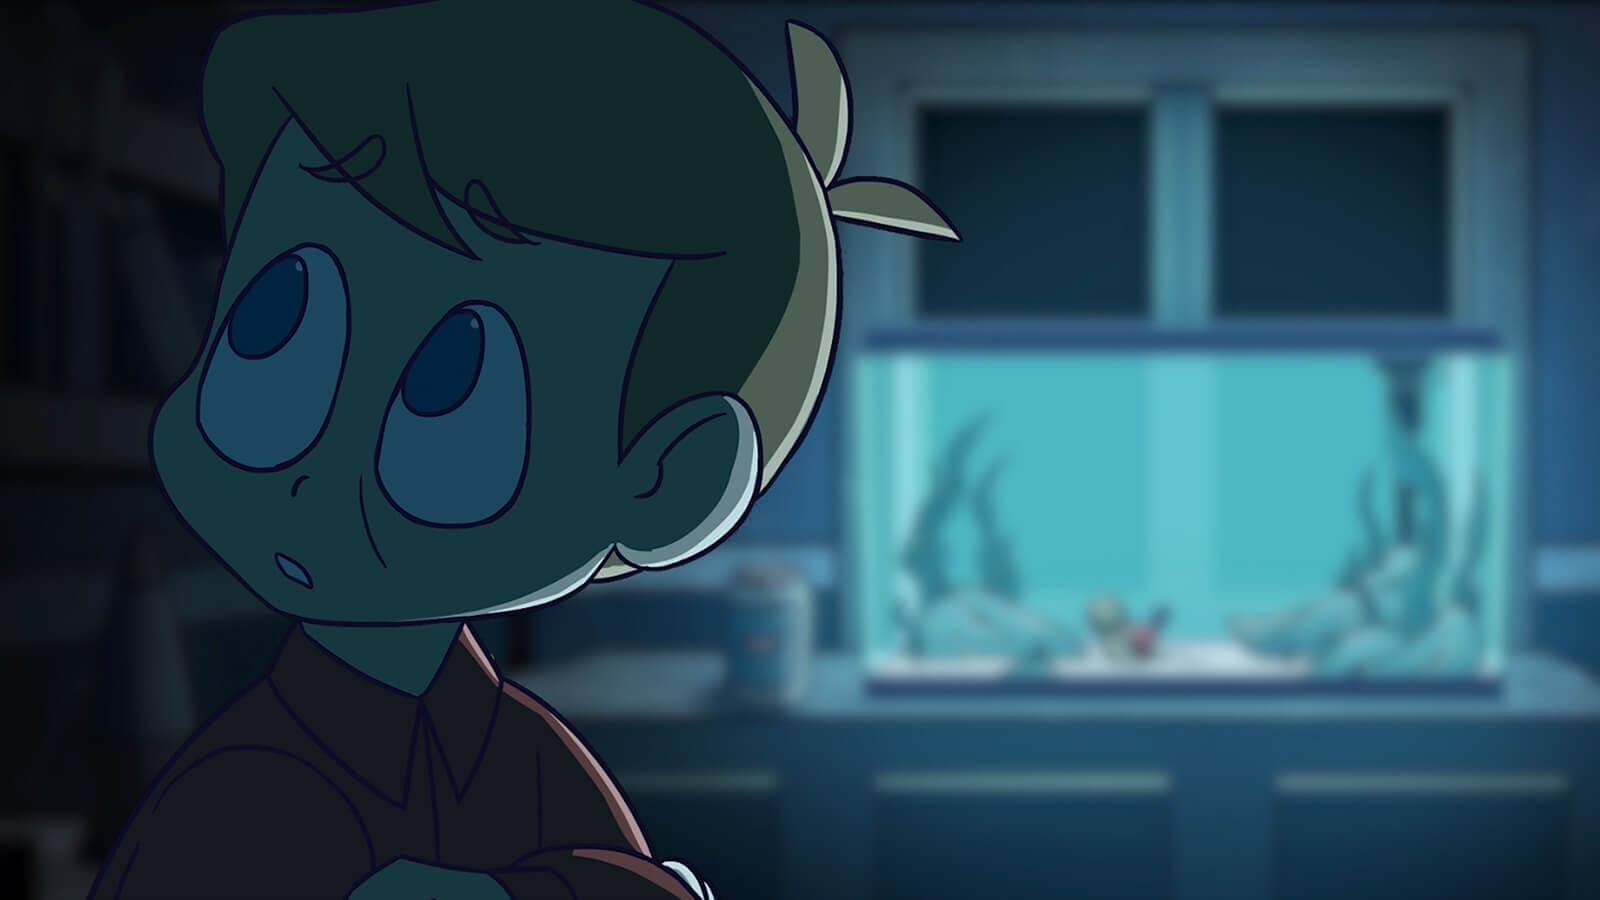 A boy in a darkened room lit by a fish tank.